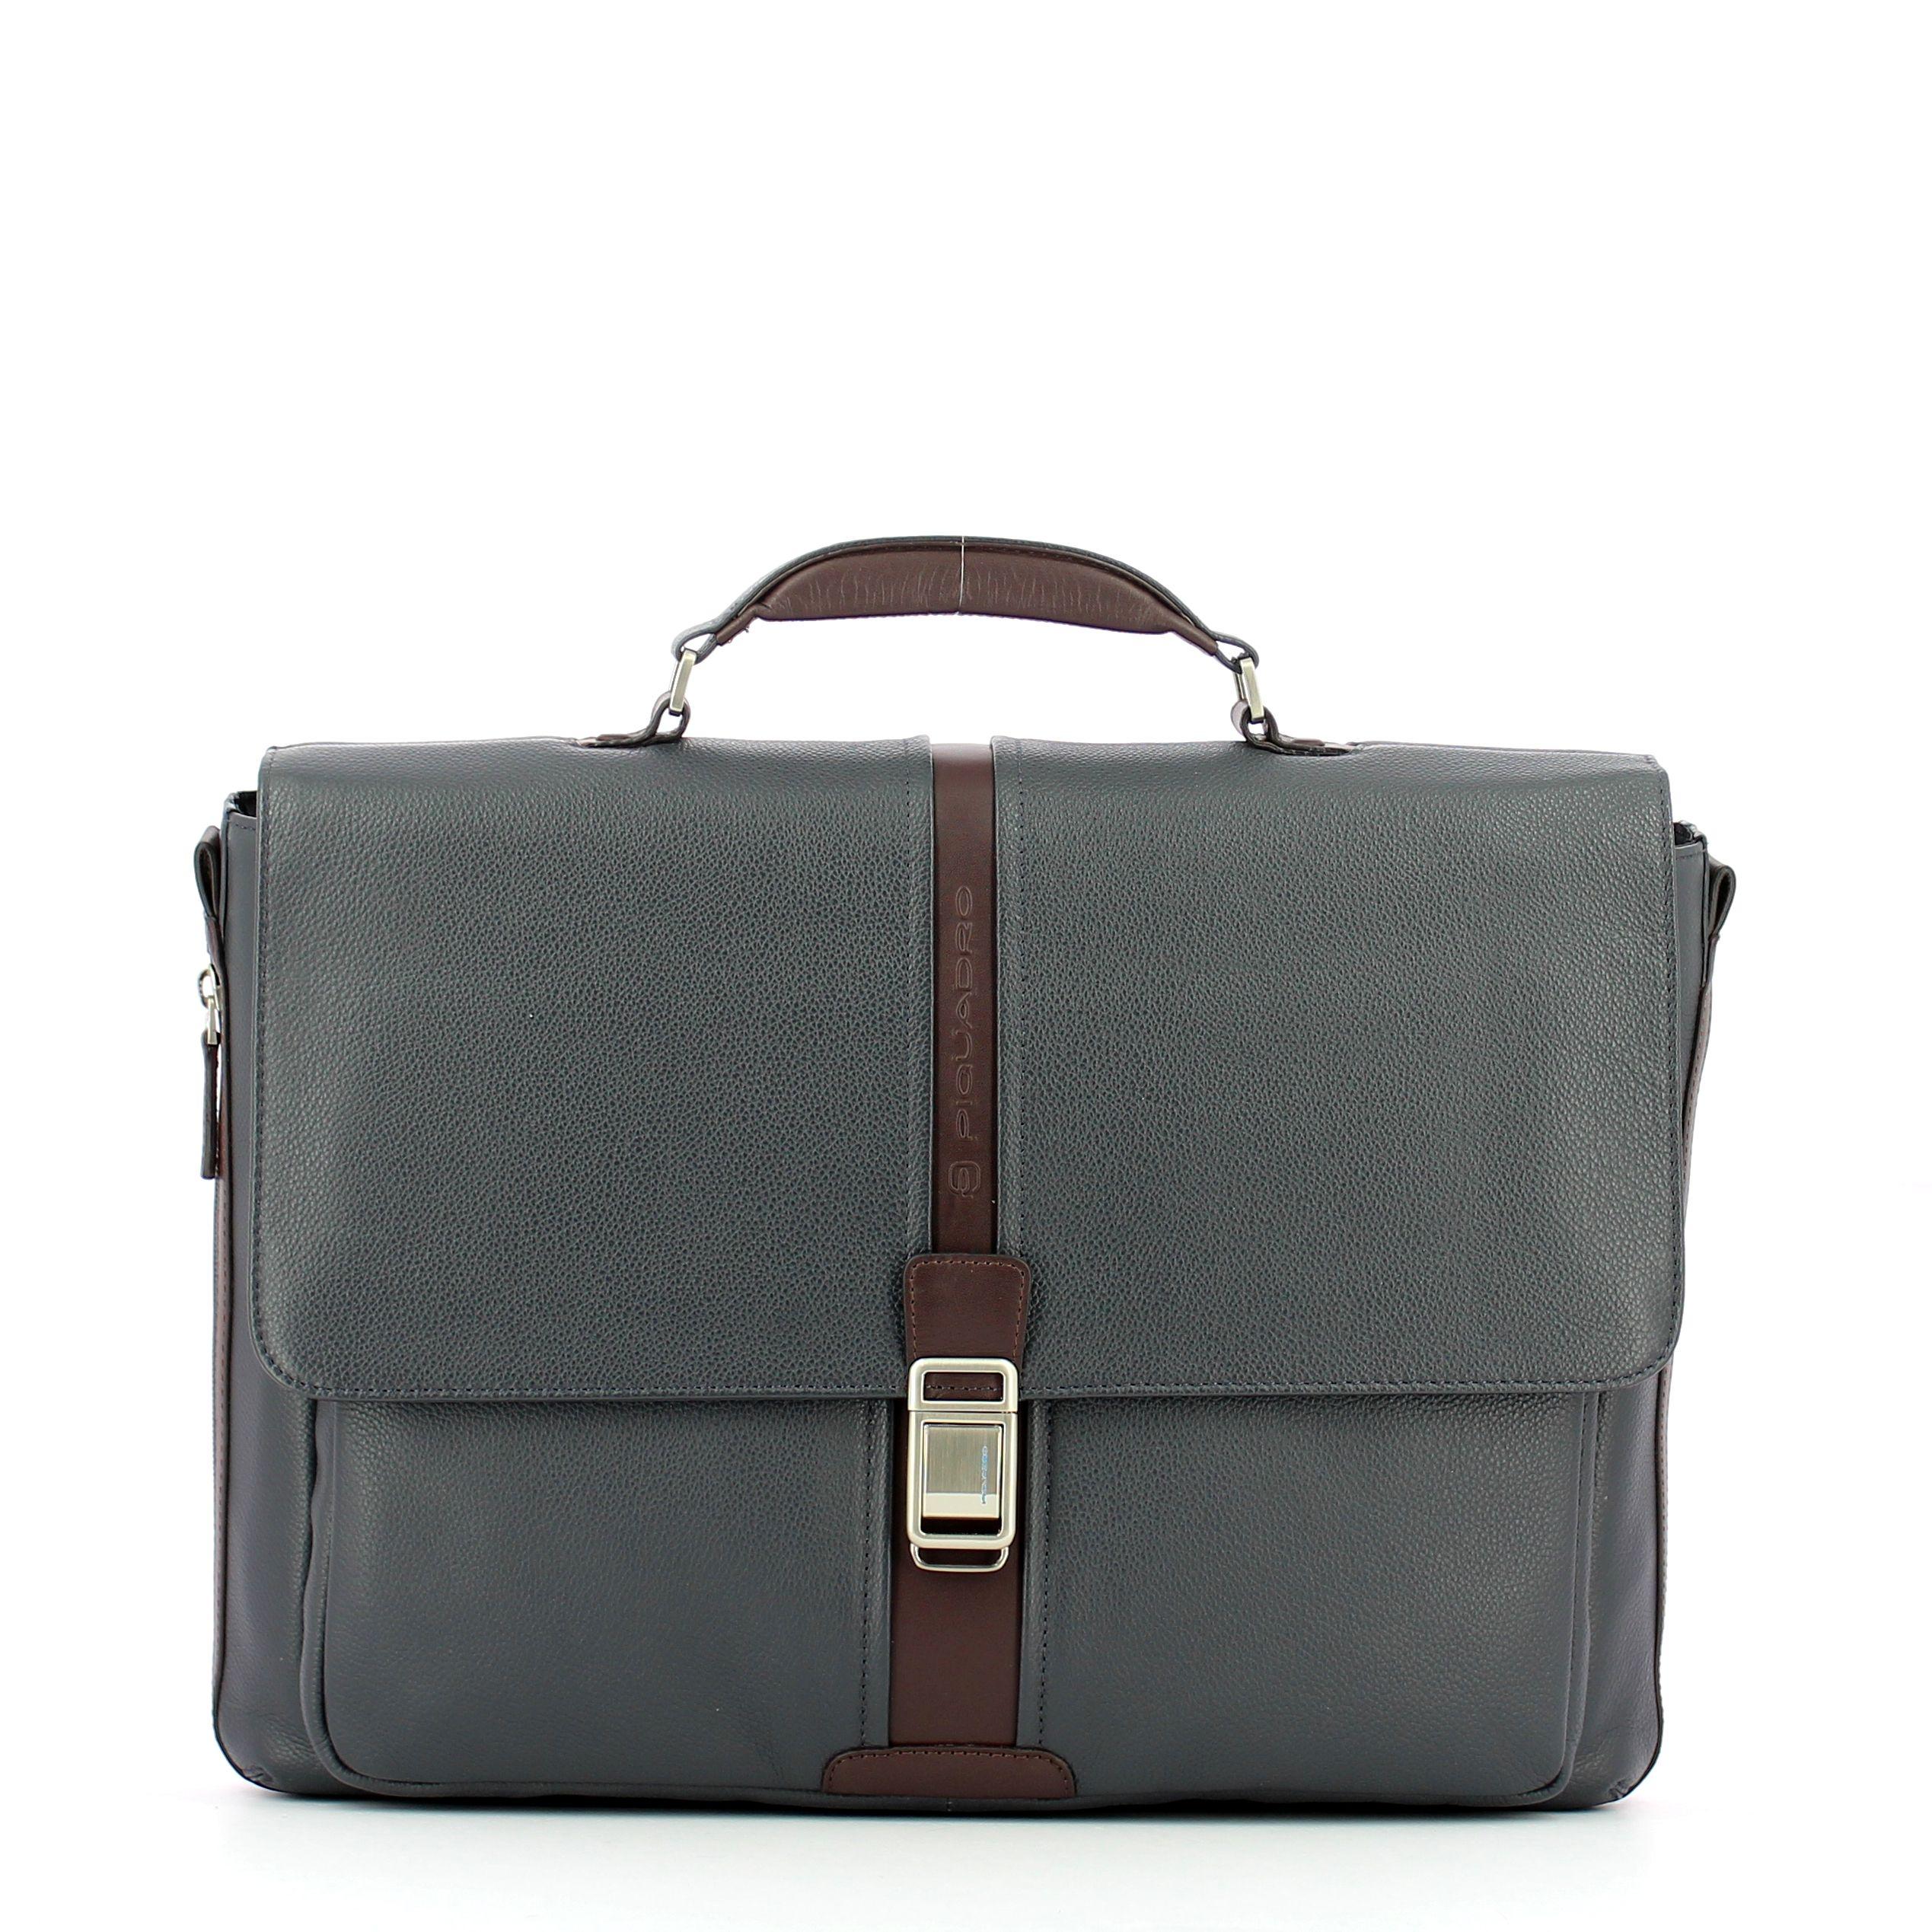 Expandable leather Laptopbag 14.0 Piquadro BLU MARRONE